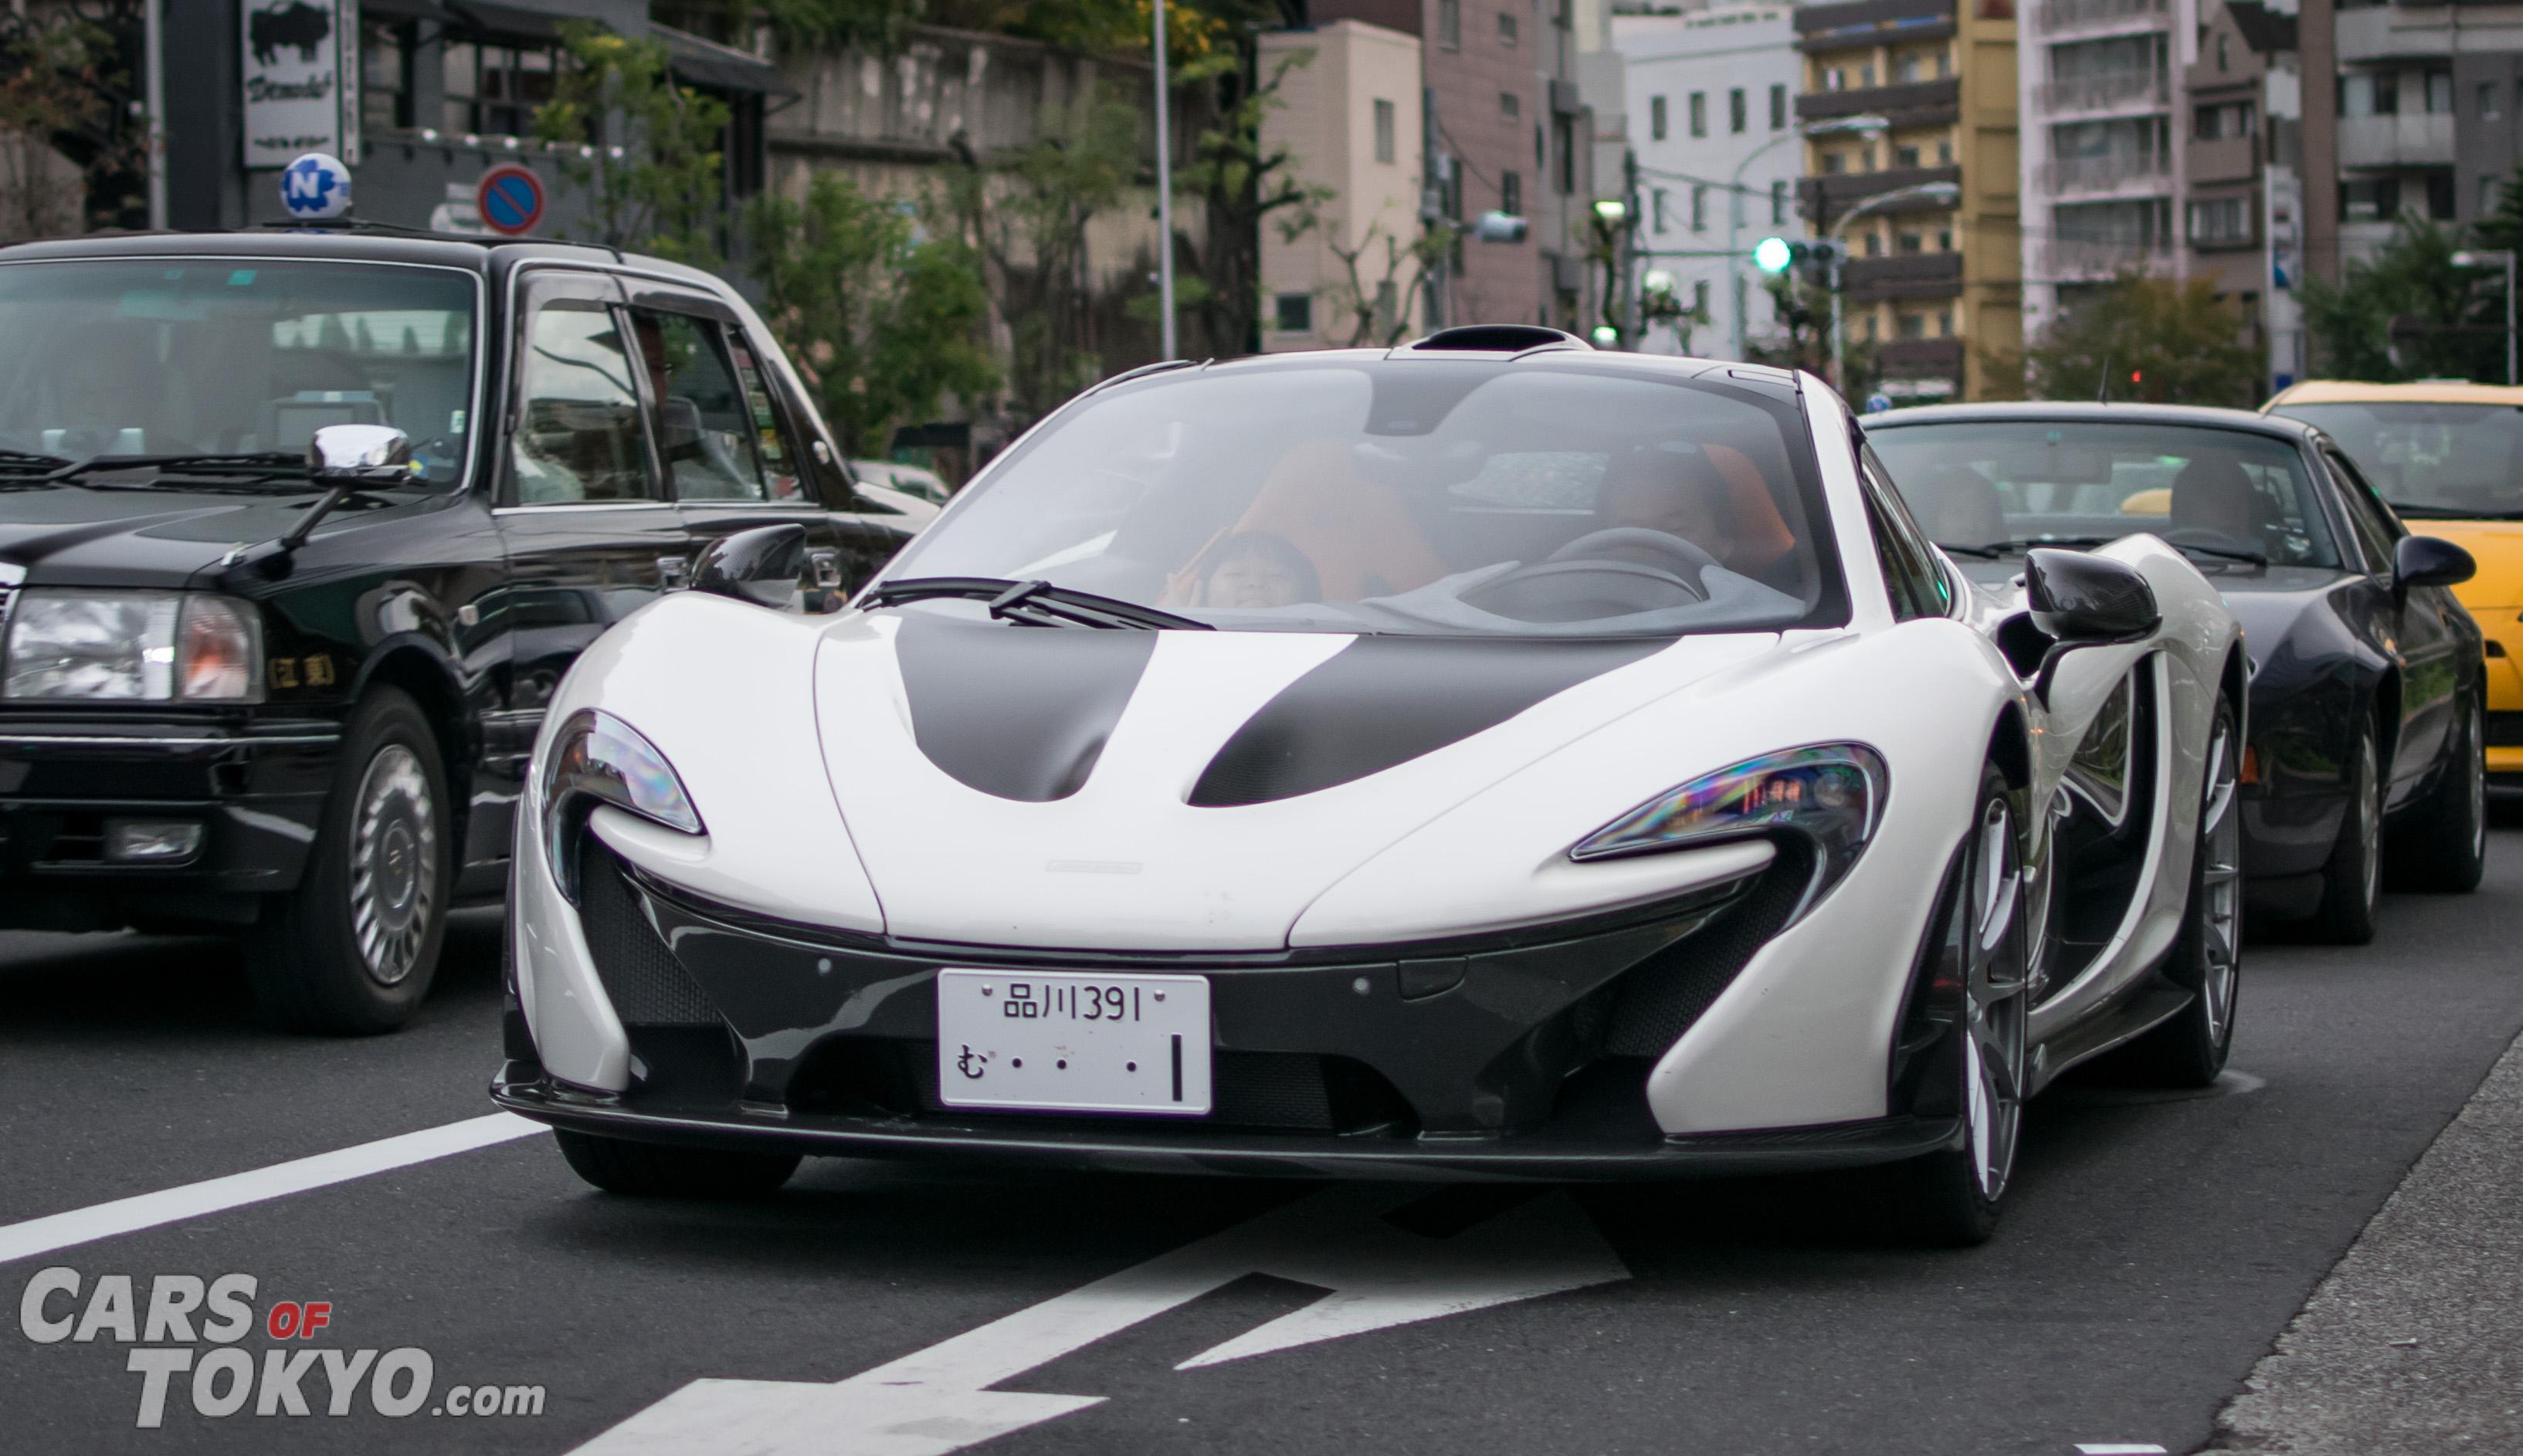 Cars of Tokyo Roppongi McLaren P1